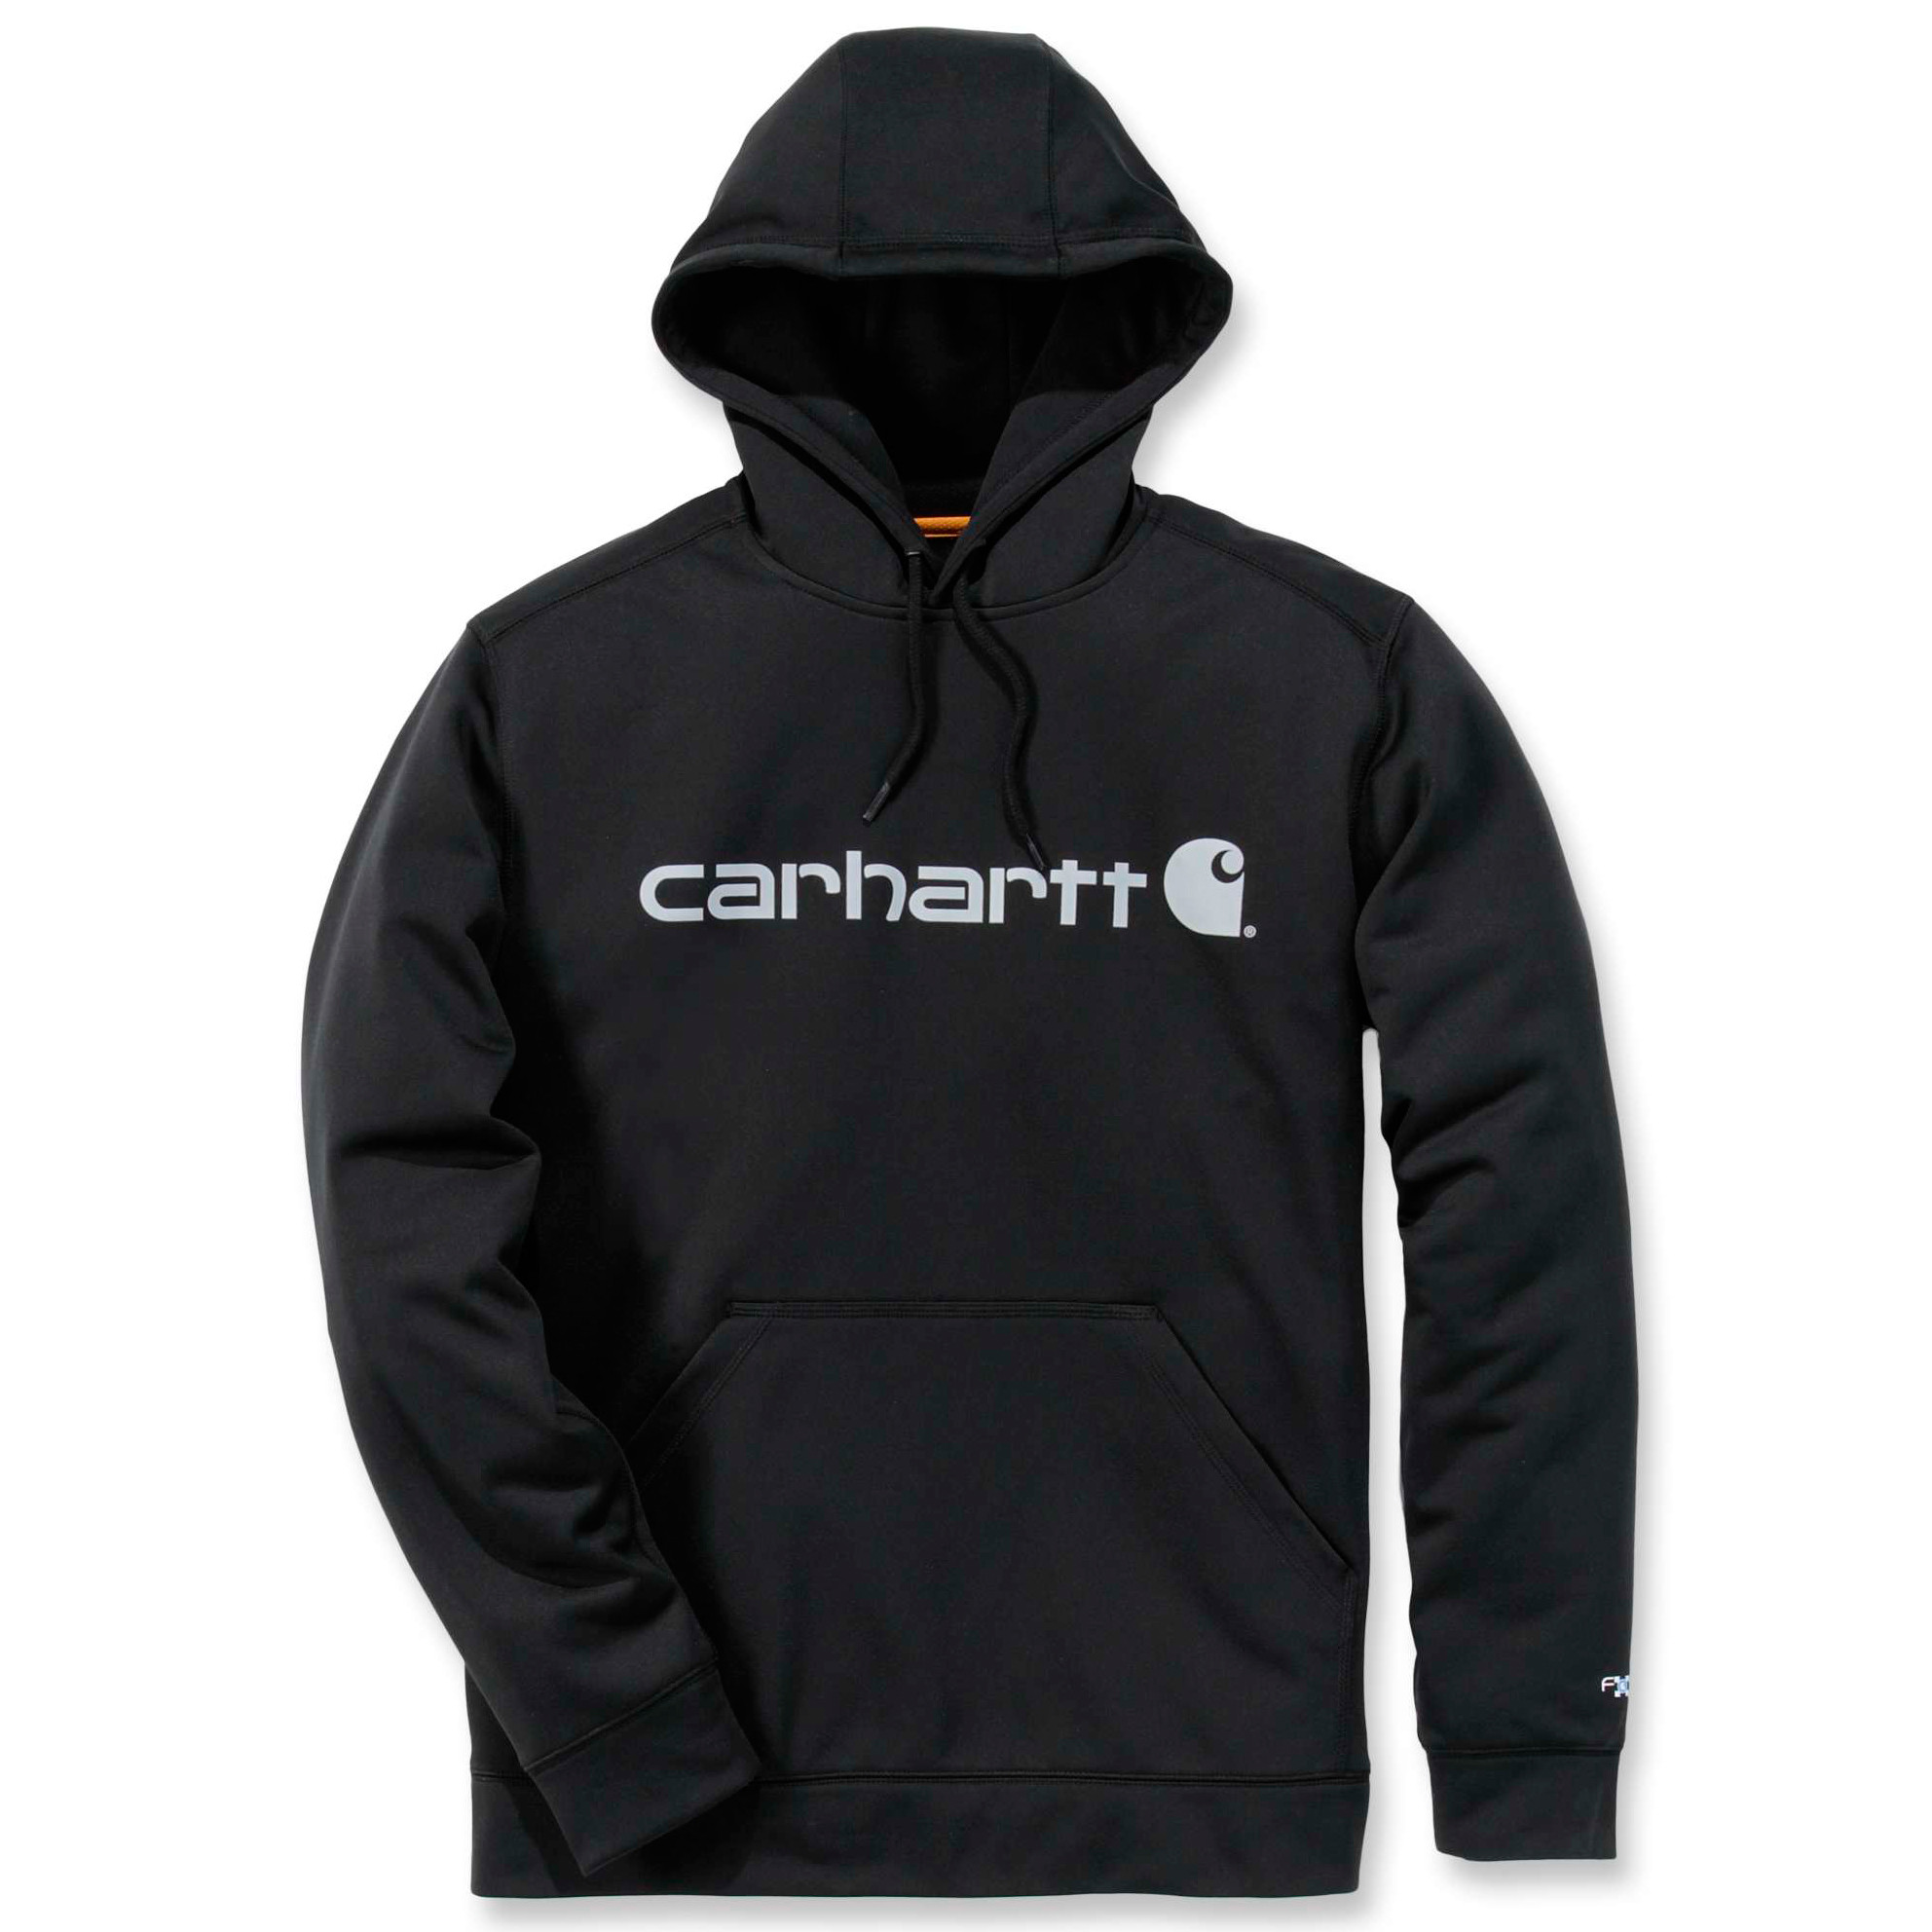 Худи Carhartt Force Extremes Logo Hooded Sweatshirt - 102314 (Black/Coal; S)